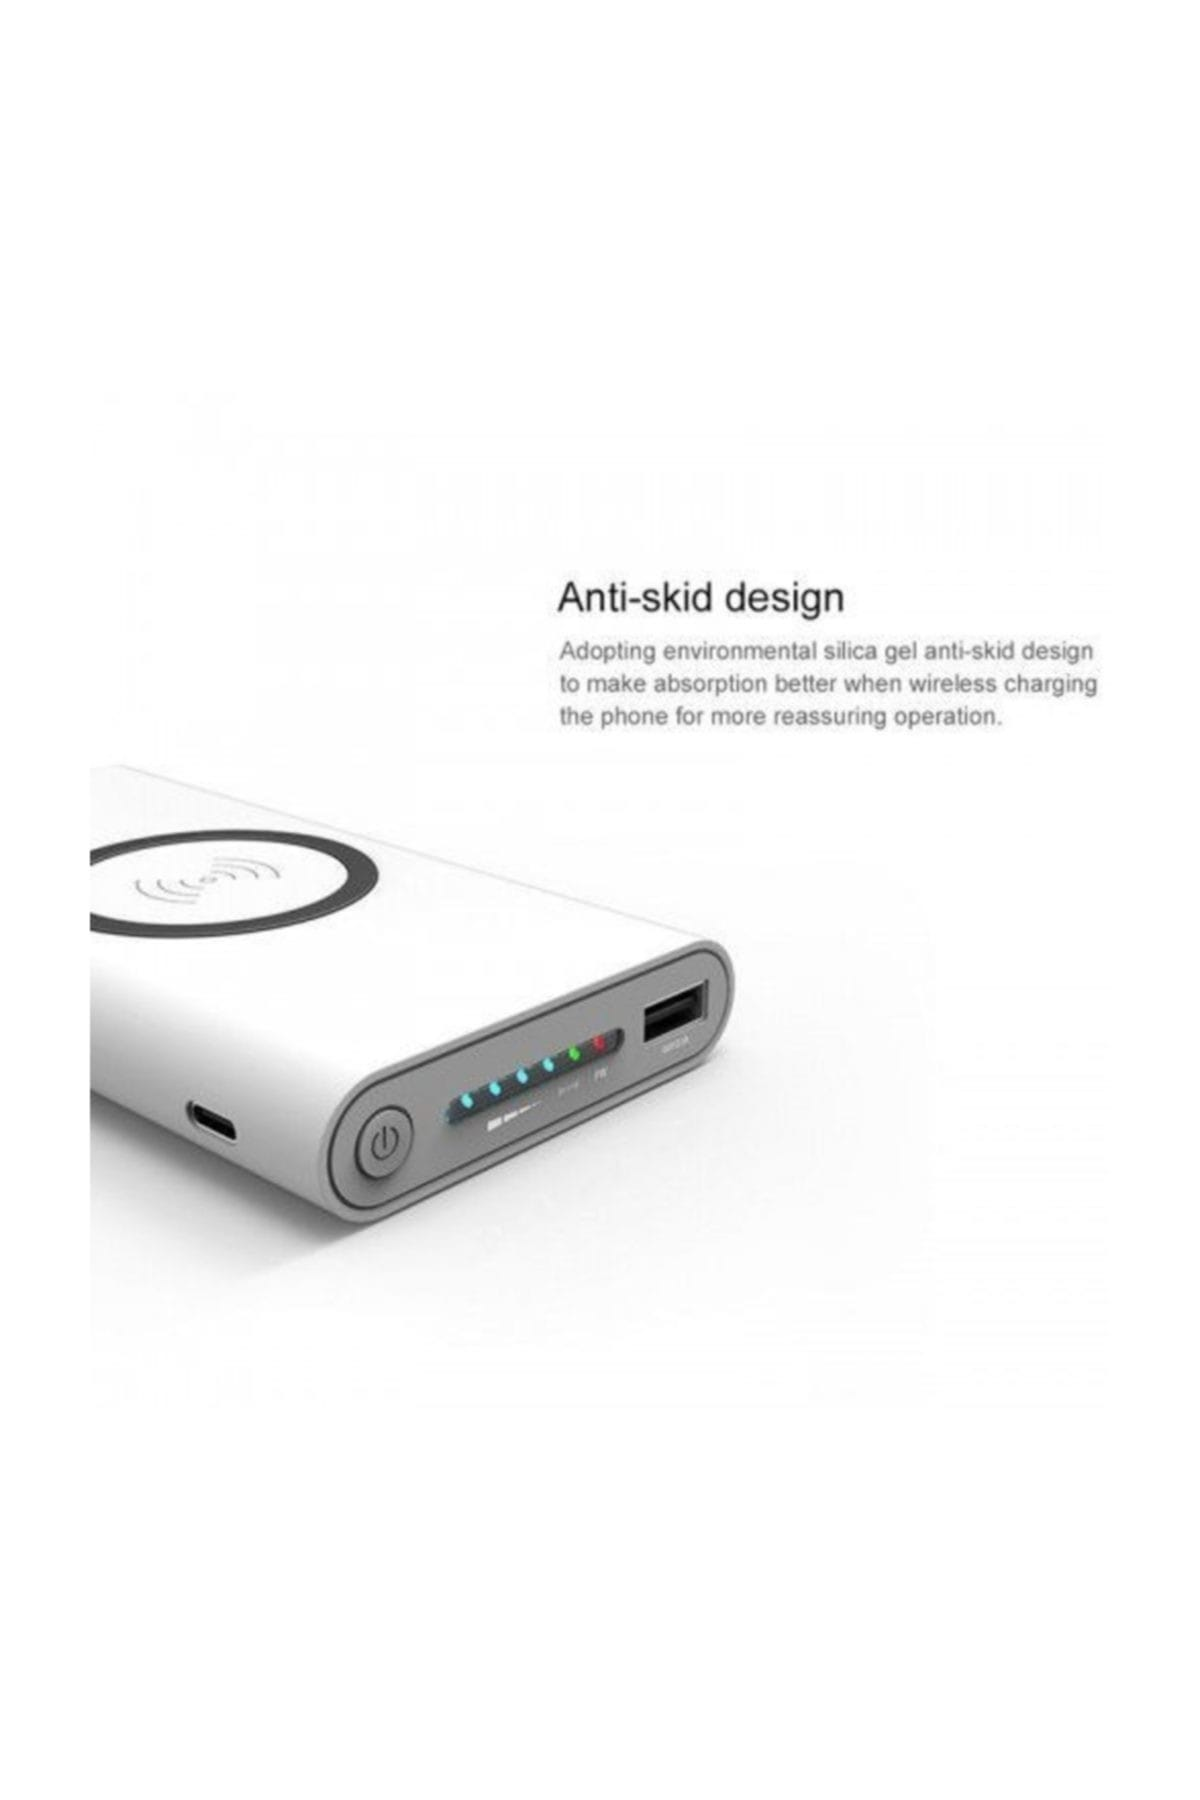 PROTECH Pro B10 Kablosuz Powerbank Taşınabilir Şarj Cihazı 10000 Mah Beyaz 2